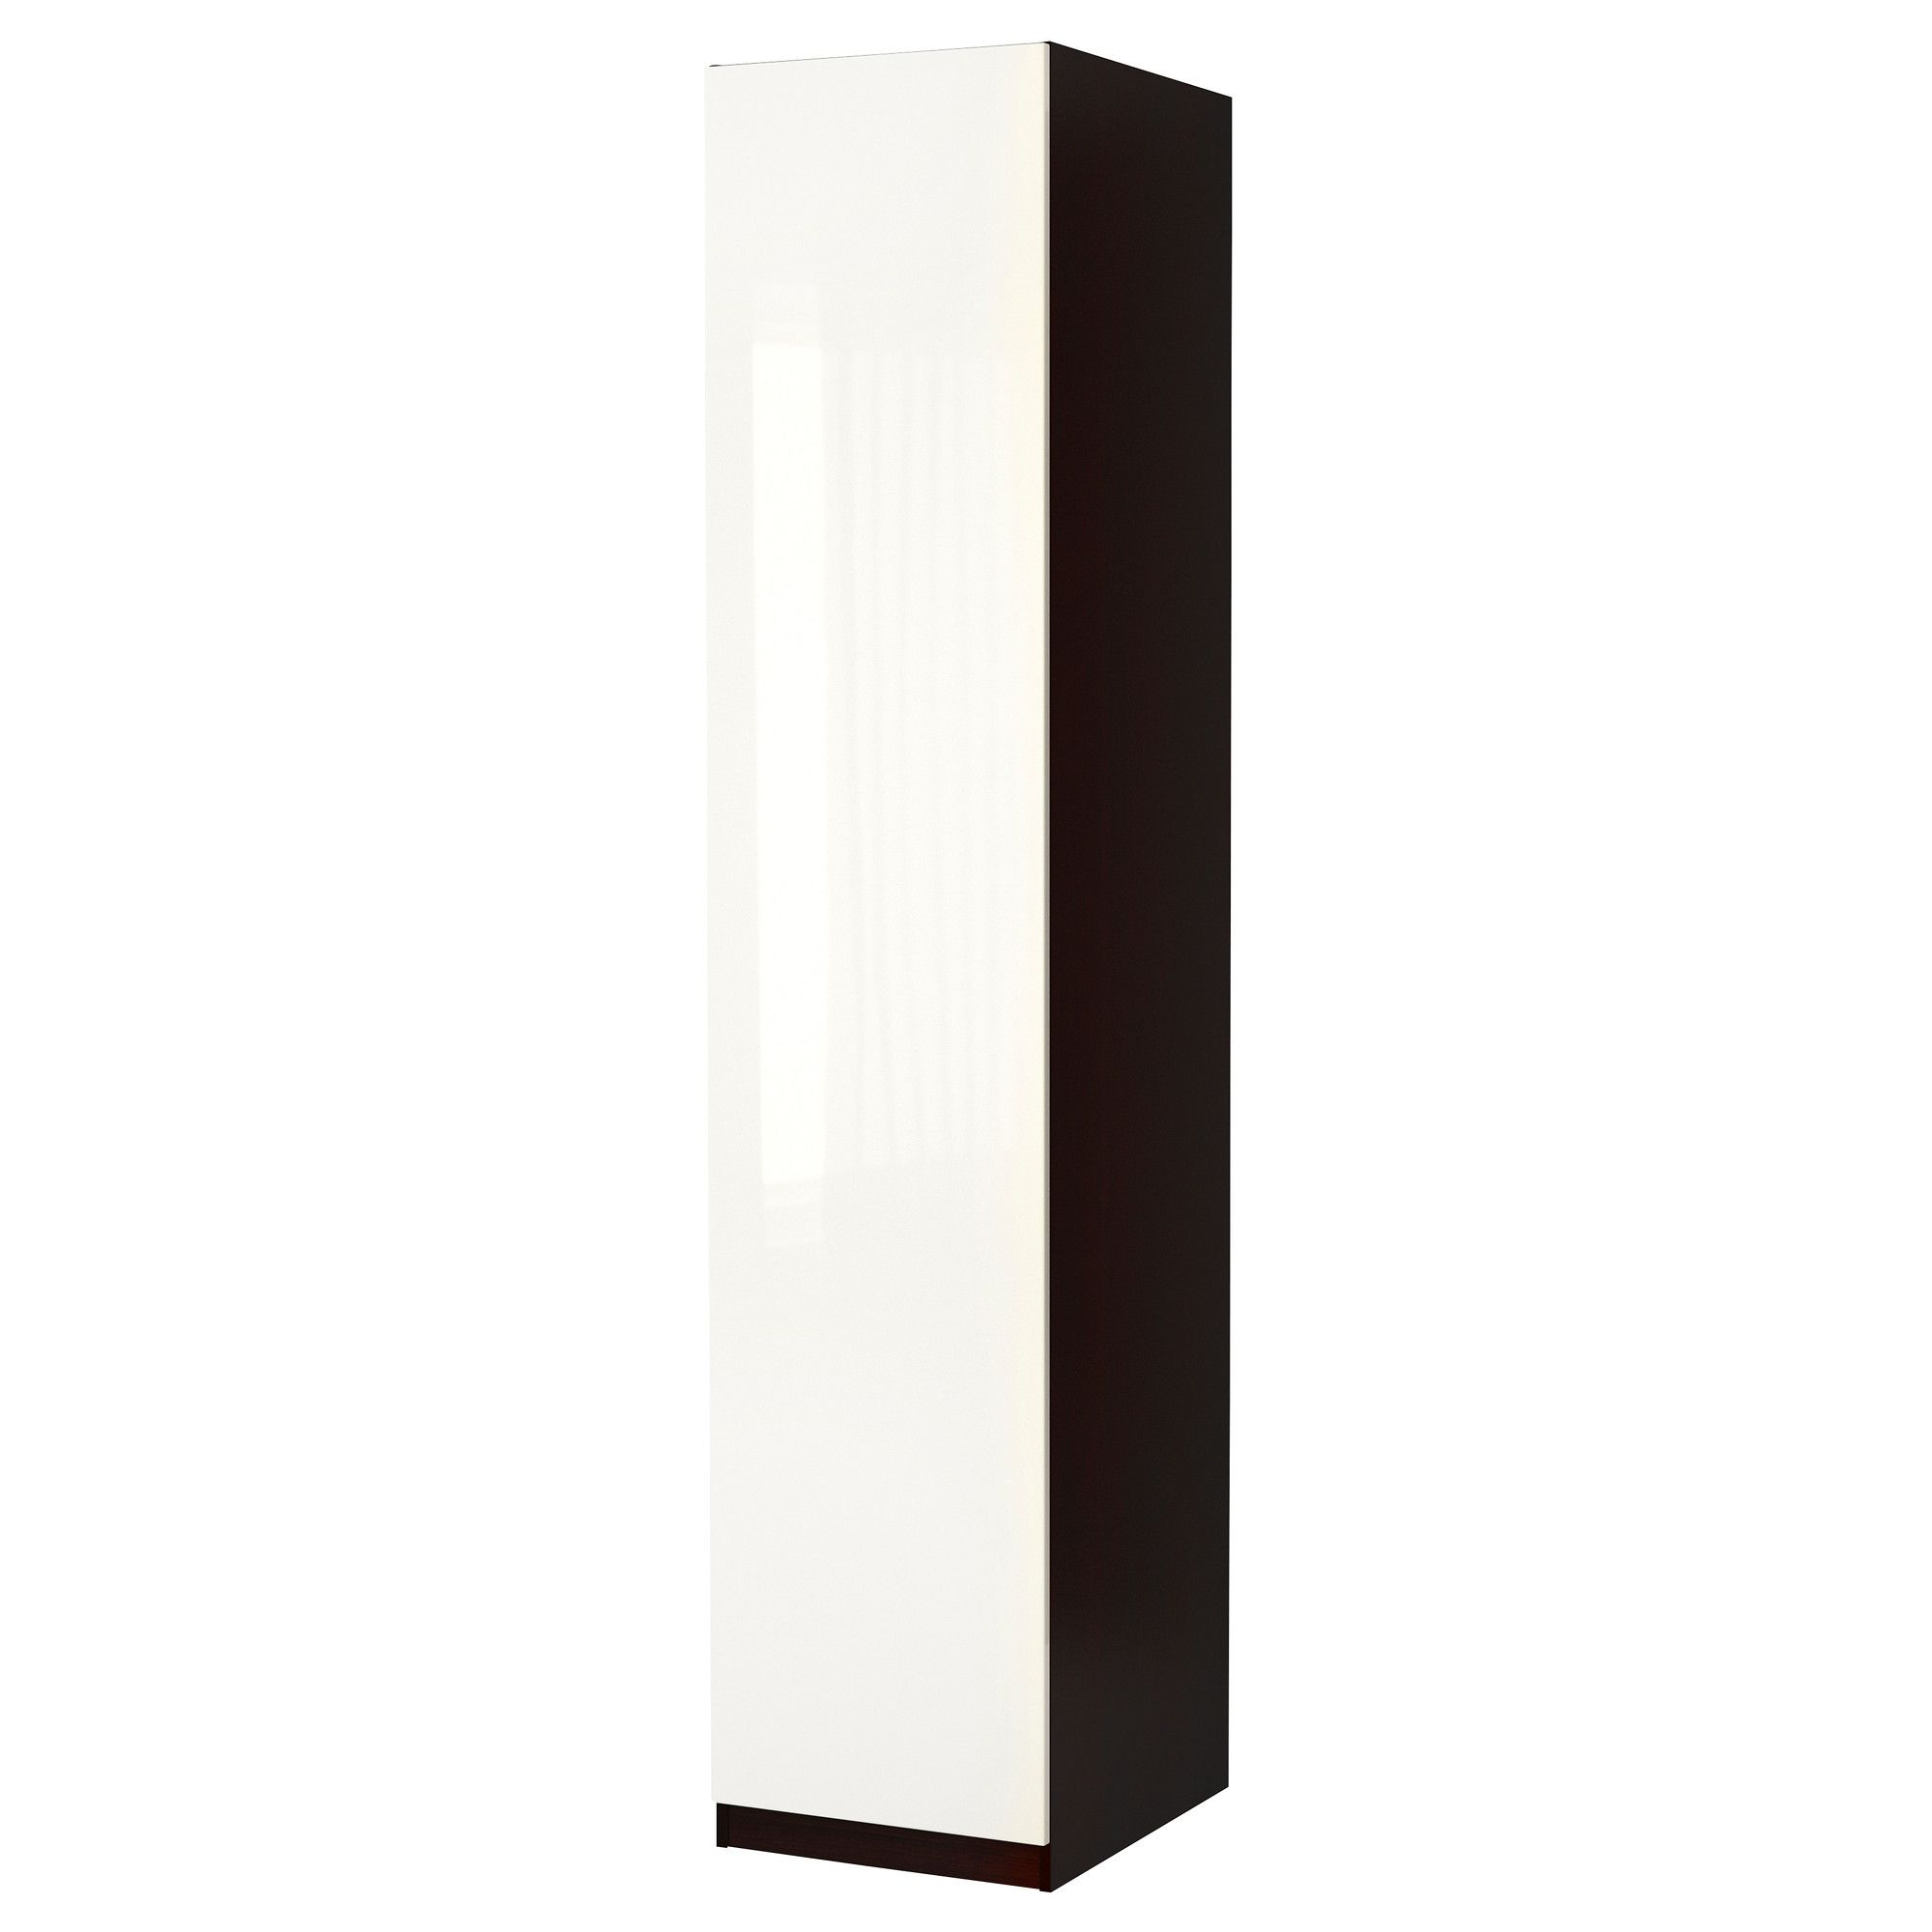 Pax wardrobe with door fardal high gloss white blackbrown